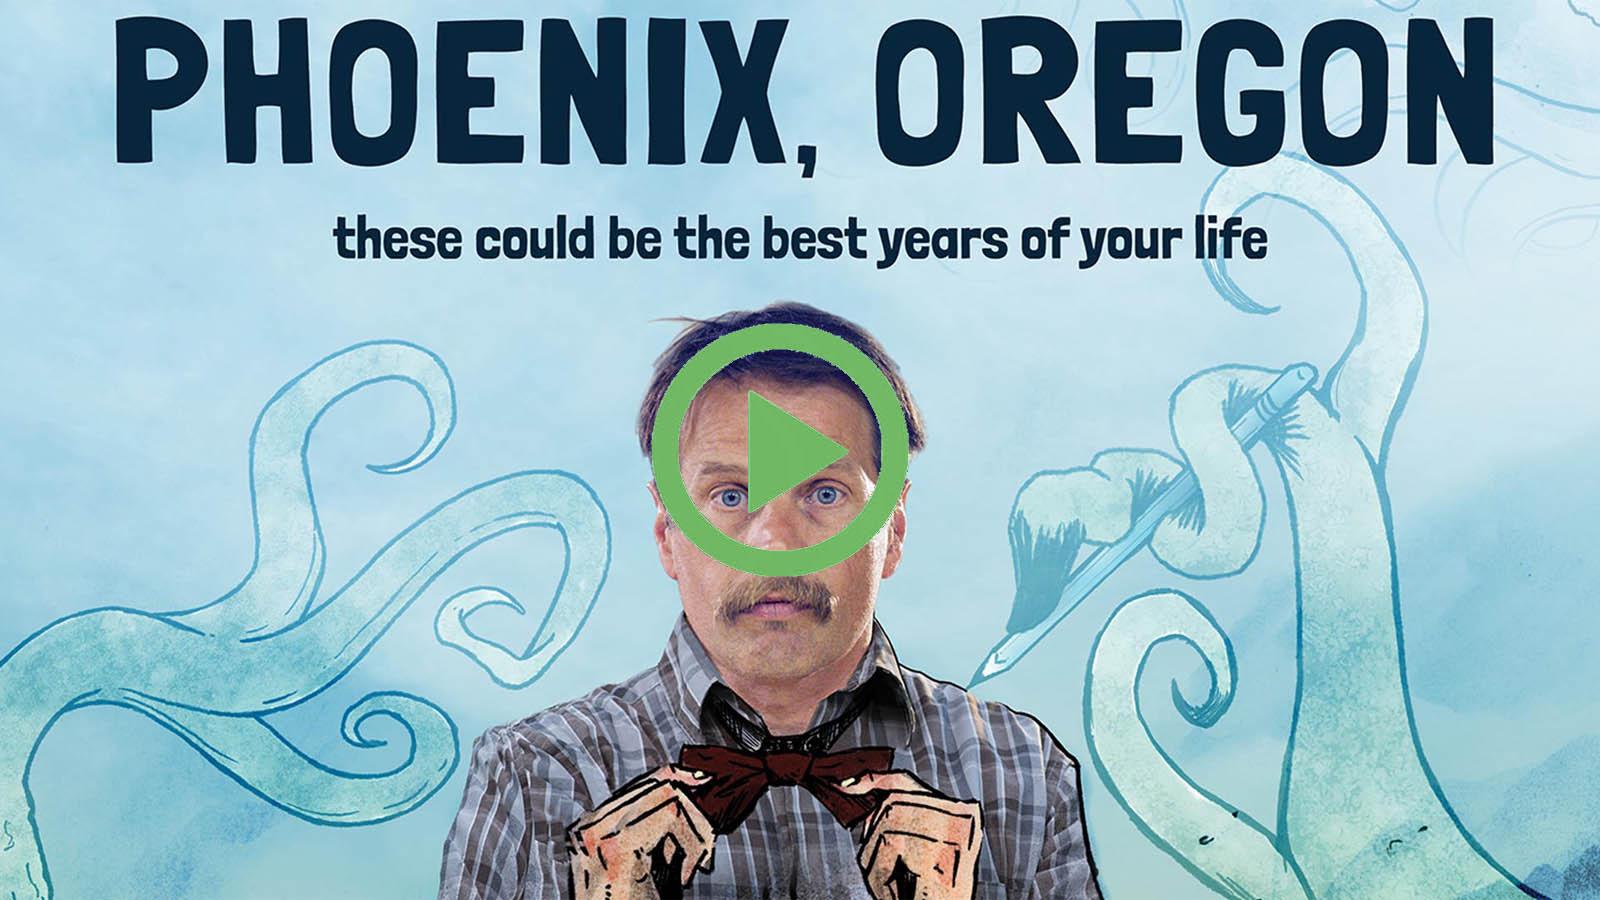 Phoenix, Oregon - starring James Le Gros, Lisa Edelstein, Jesse Borrego